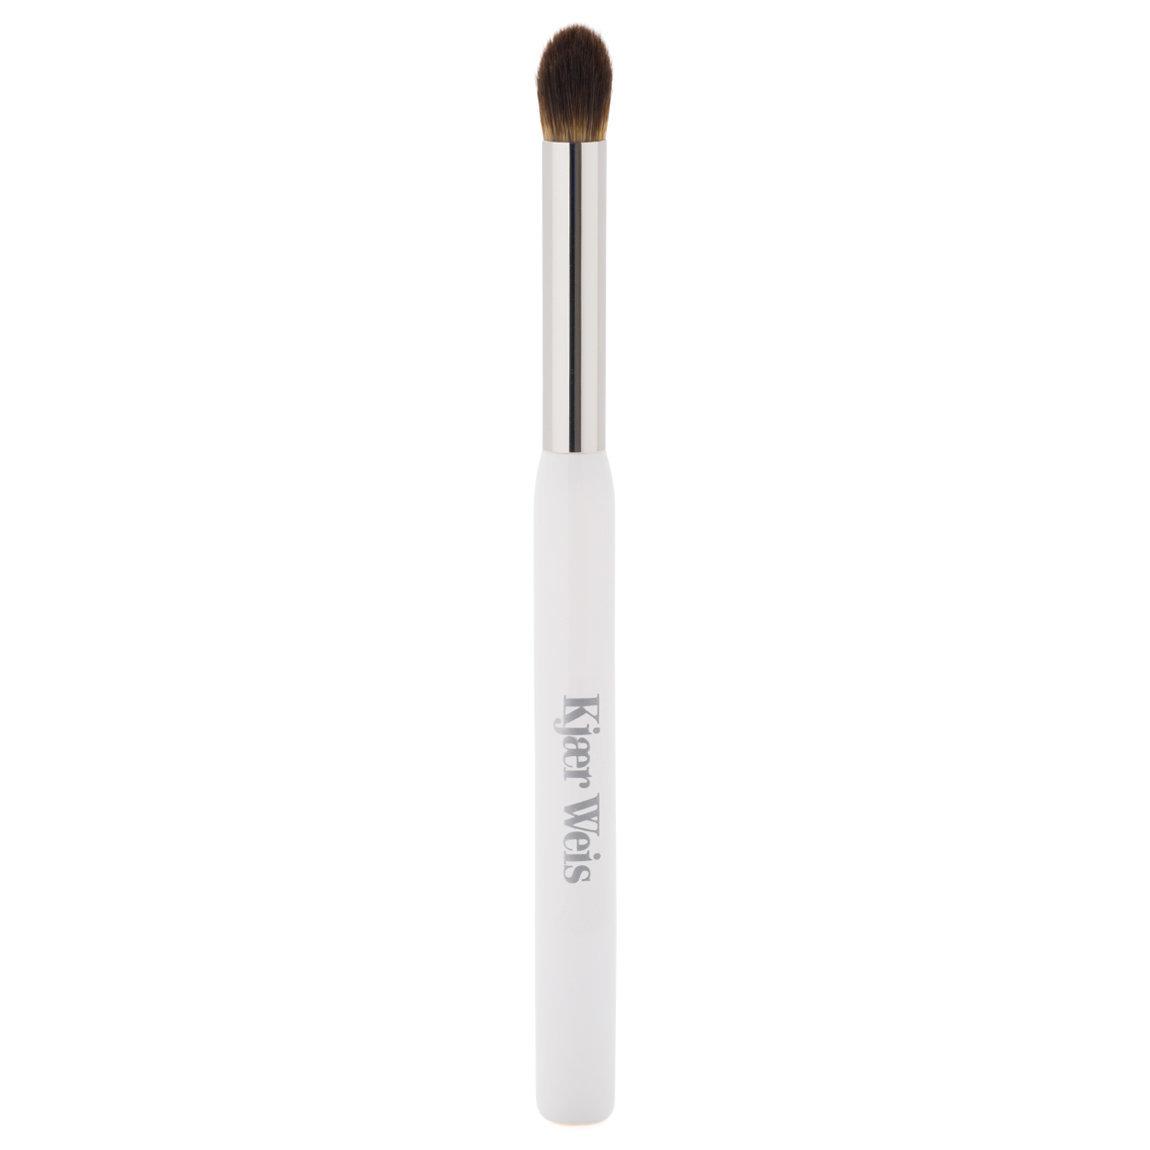 Kjaer Weis Cream Eye Shadow Brush product swatch.